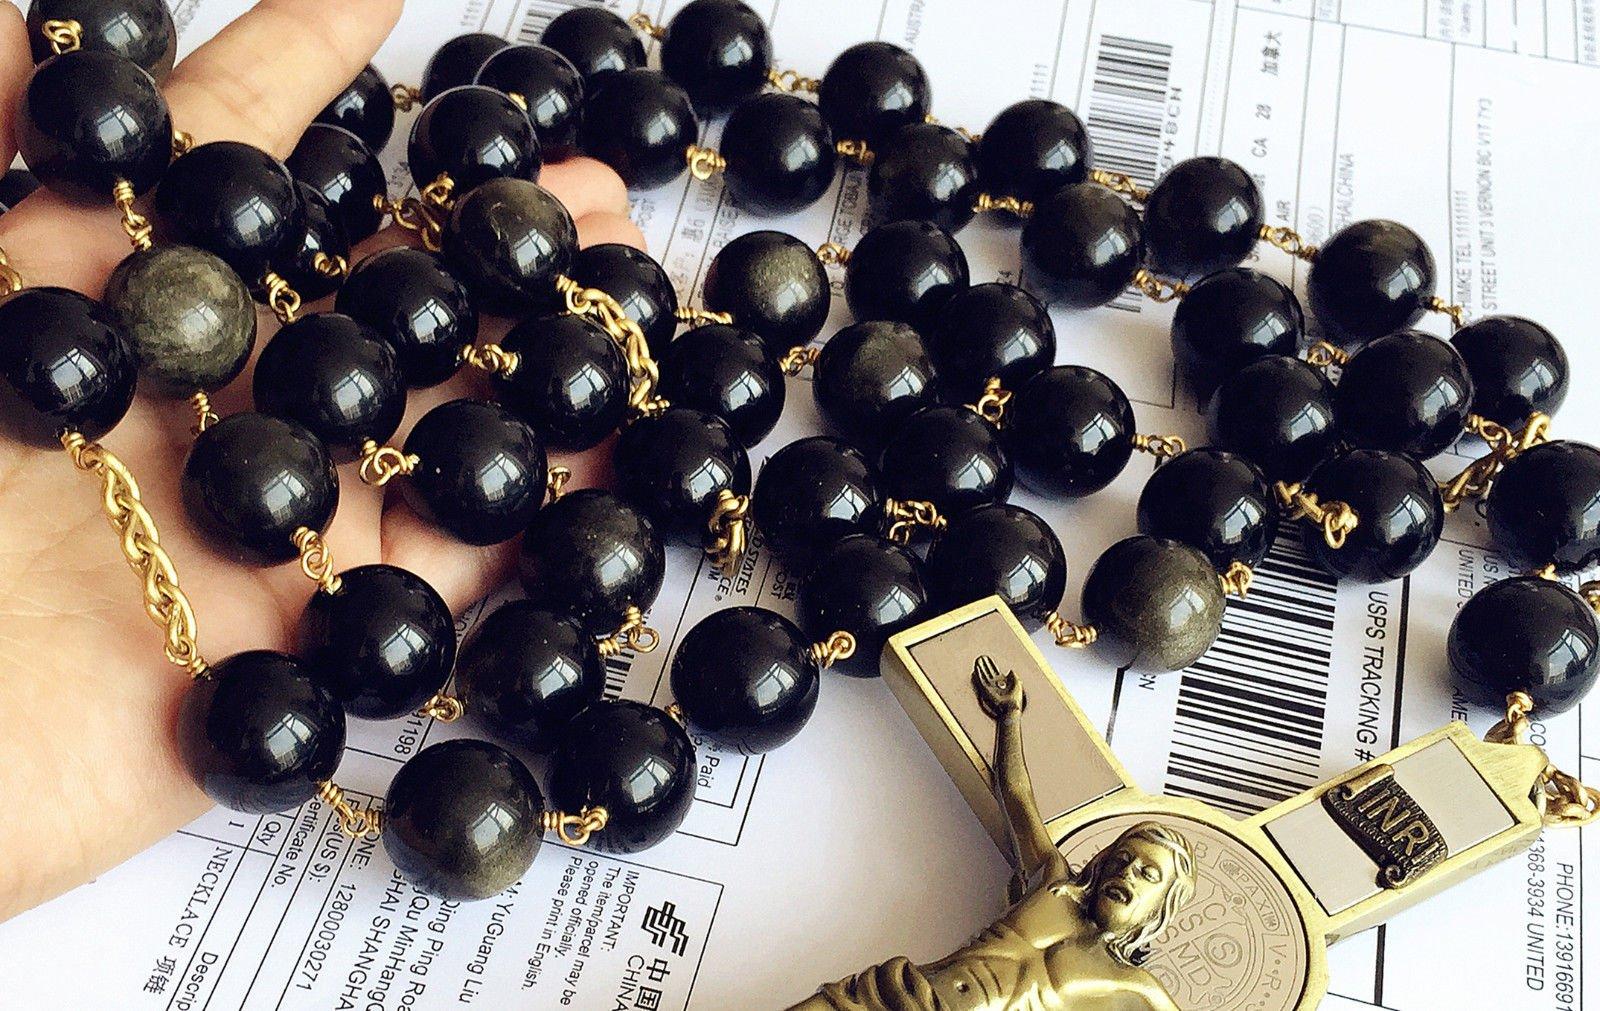 elegantmedical Handmade Large 20MM Black Gold Obsidian Bead Wall Rosary Cross St.Benedict Crucifix Catholic Gift Box by elegantmedical (Image #6)